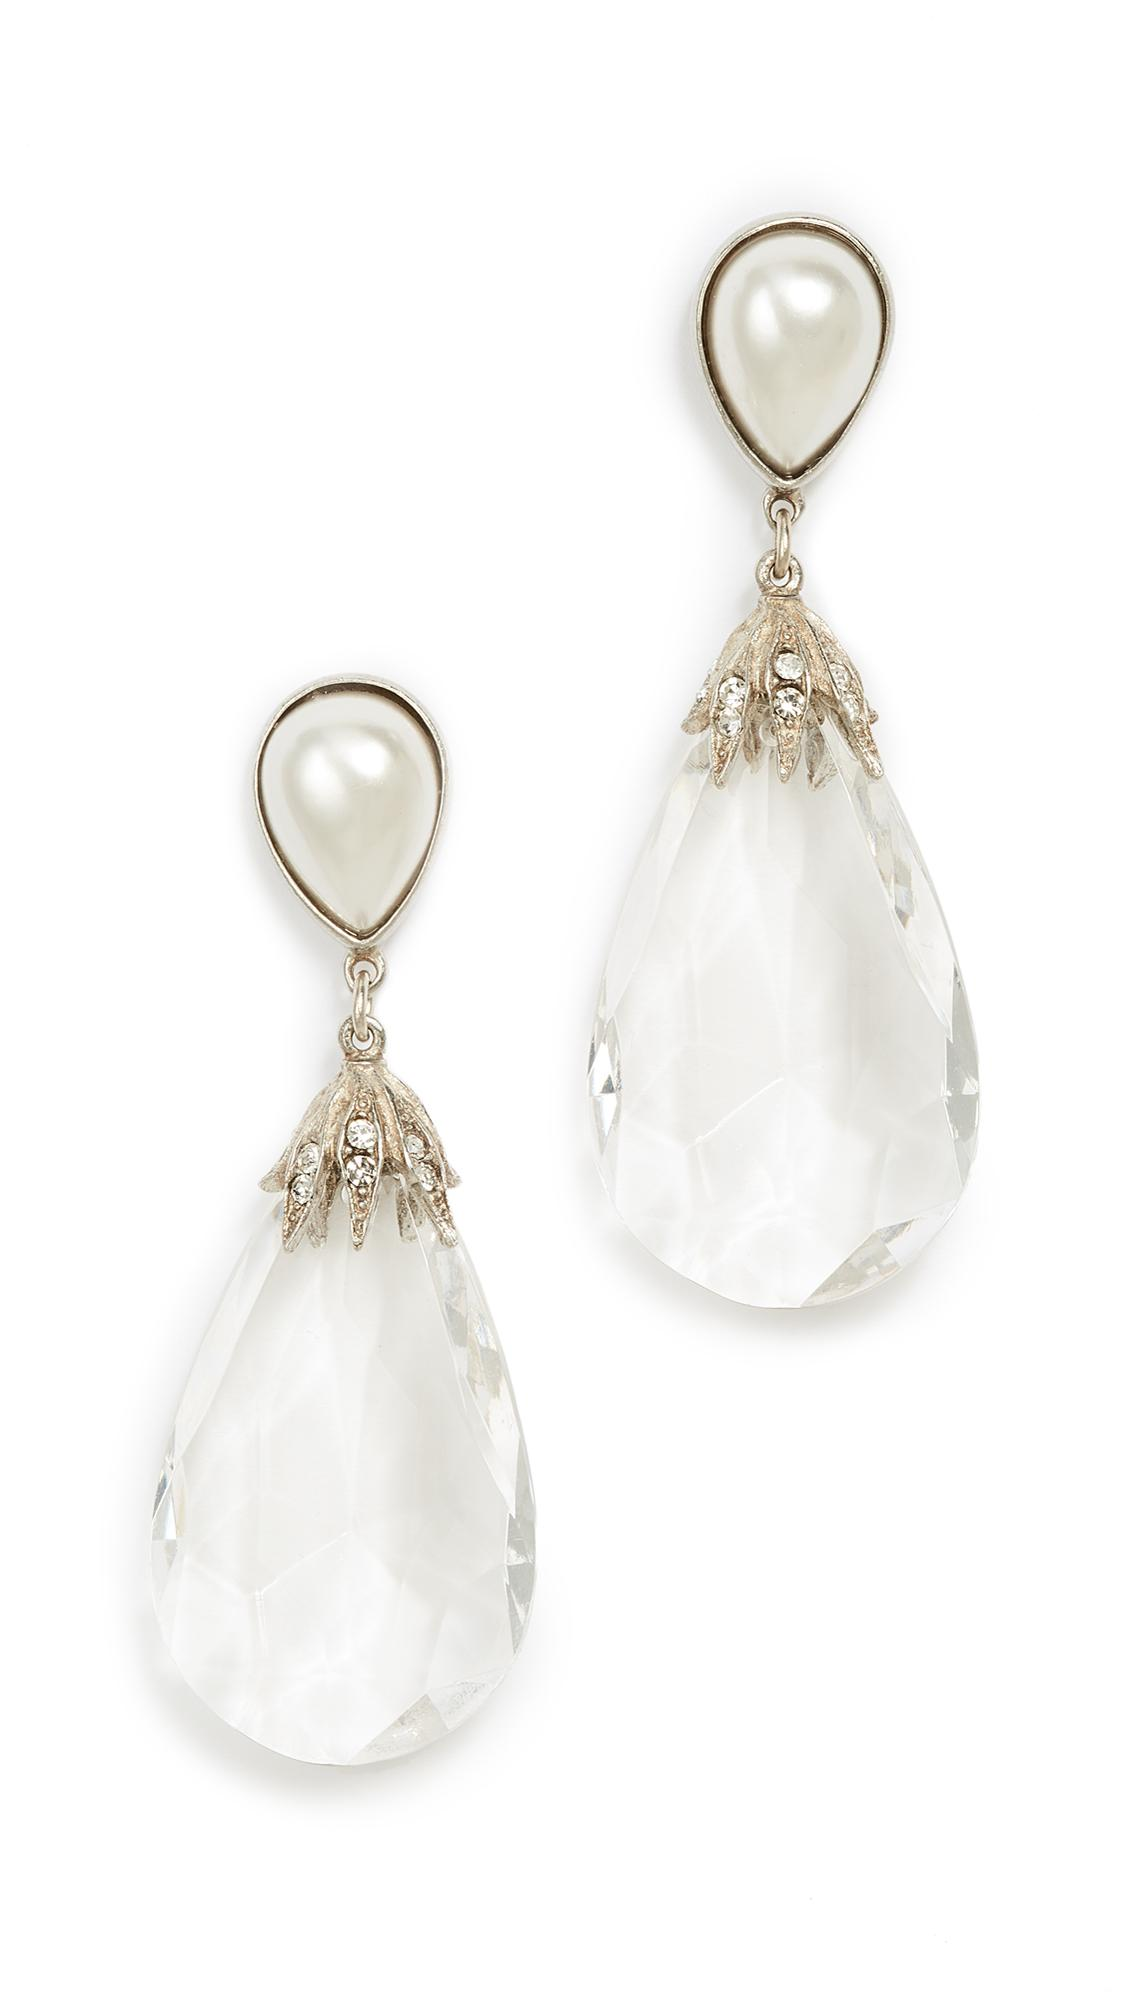 Ben-amun Anna Earrings In Silver/pearl